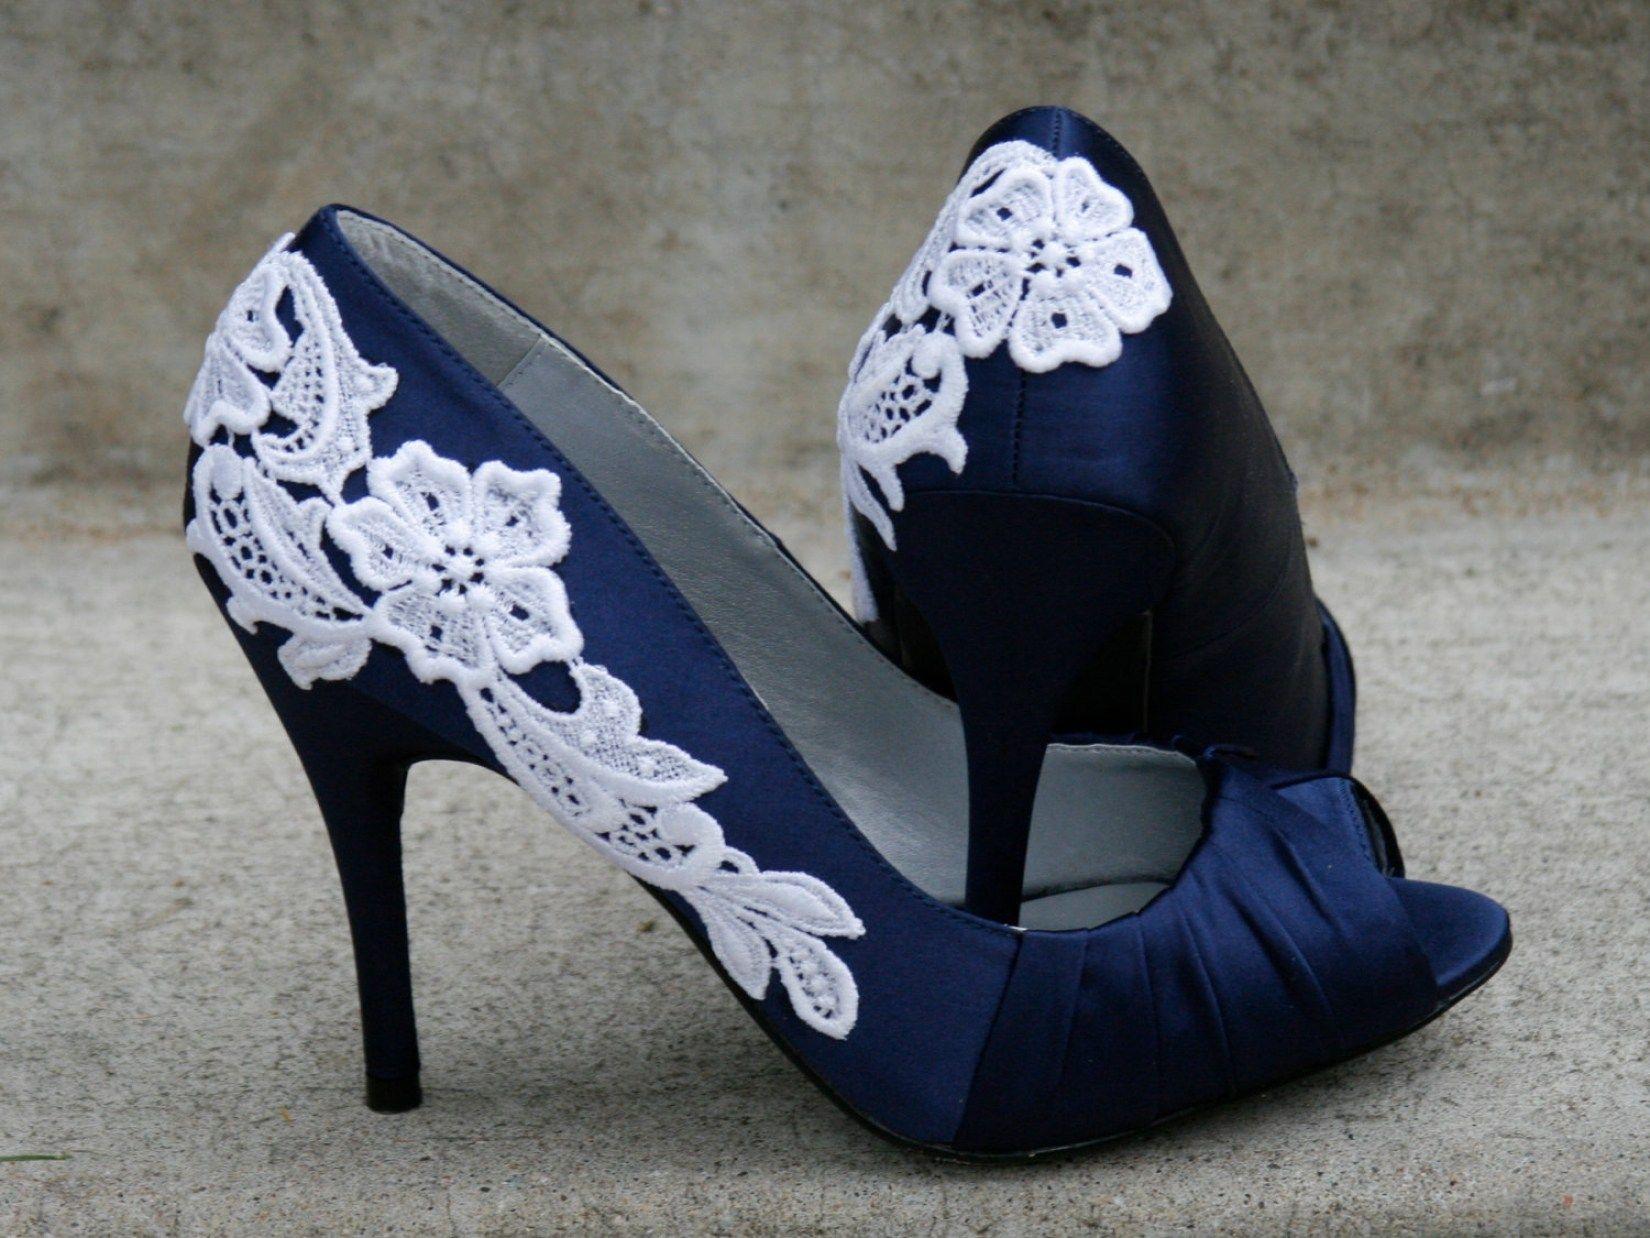 33 Beautiful Navy Blue Wedge Wedding Shoes Best Inspiration Navy Blue Wedding Shoes Navy Wedding Shoes Wedding Shoes Wedge Blue